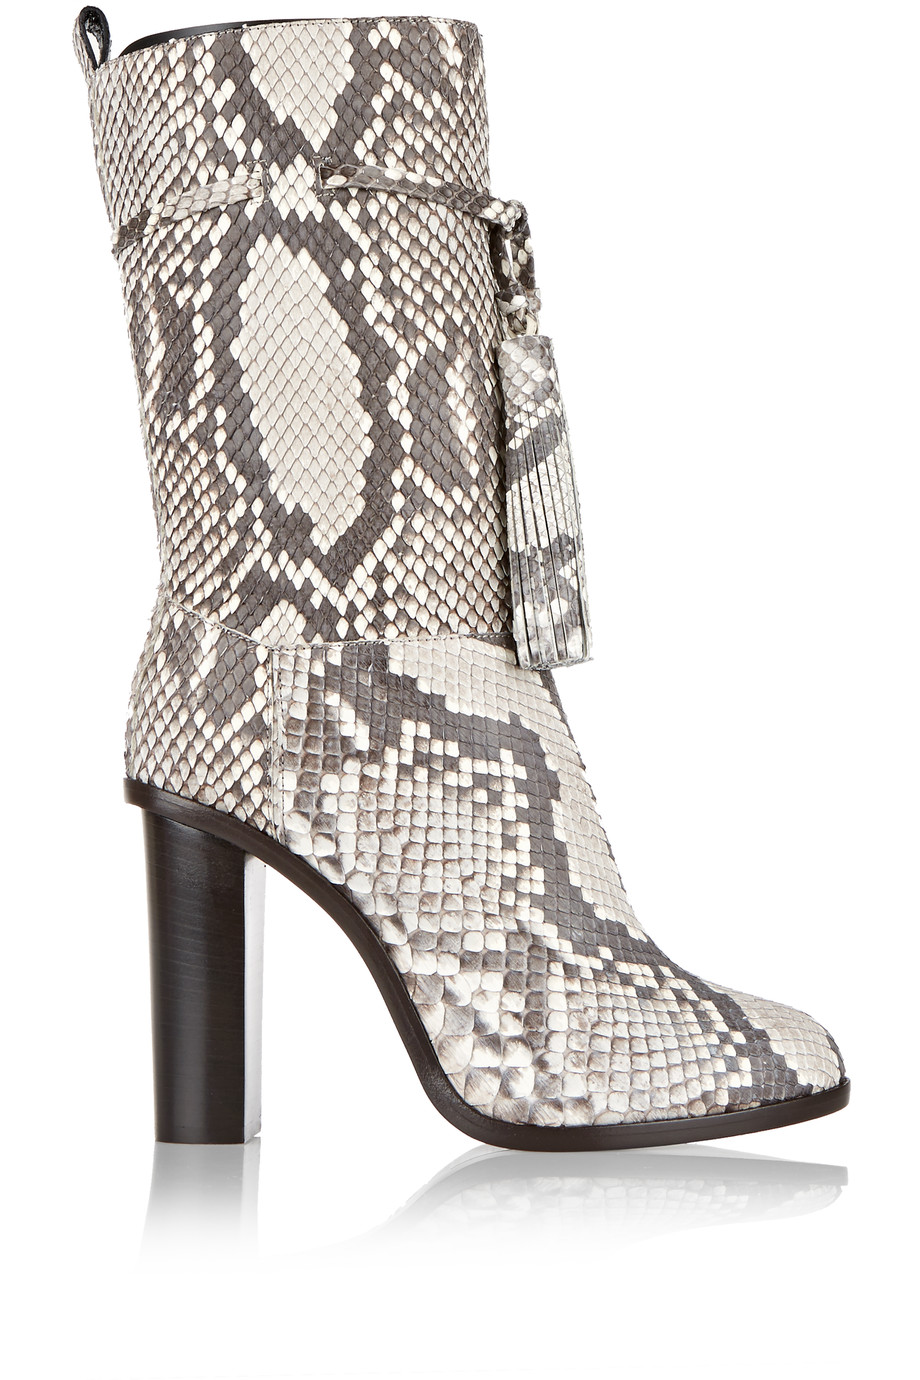 LANVIN Tasseled Python Boots in Animal Print